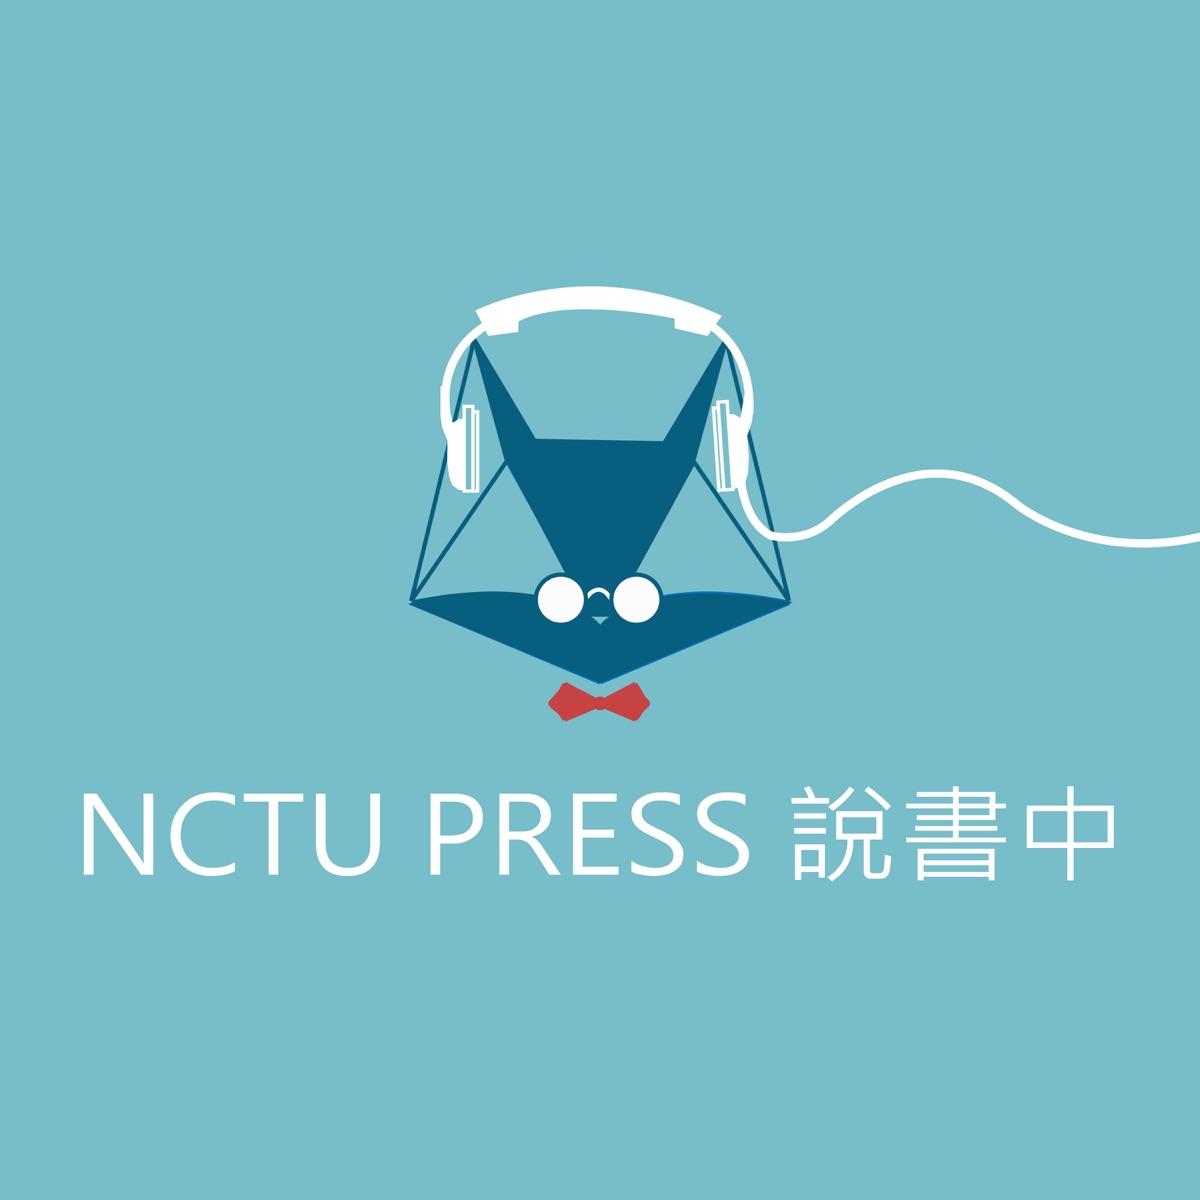 NCTU PRESS 說書中